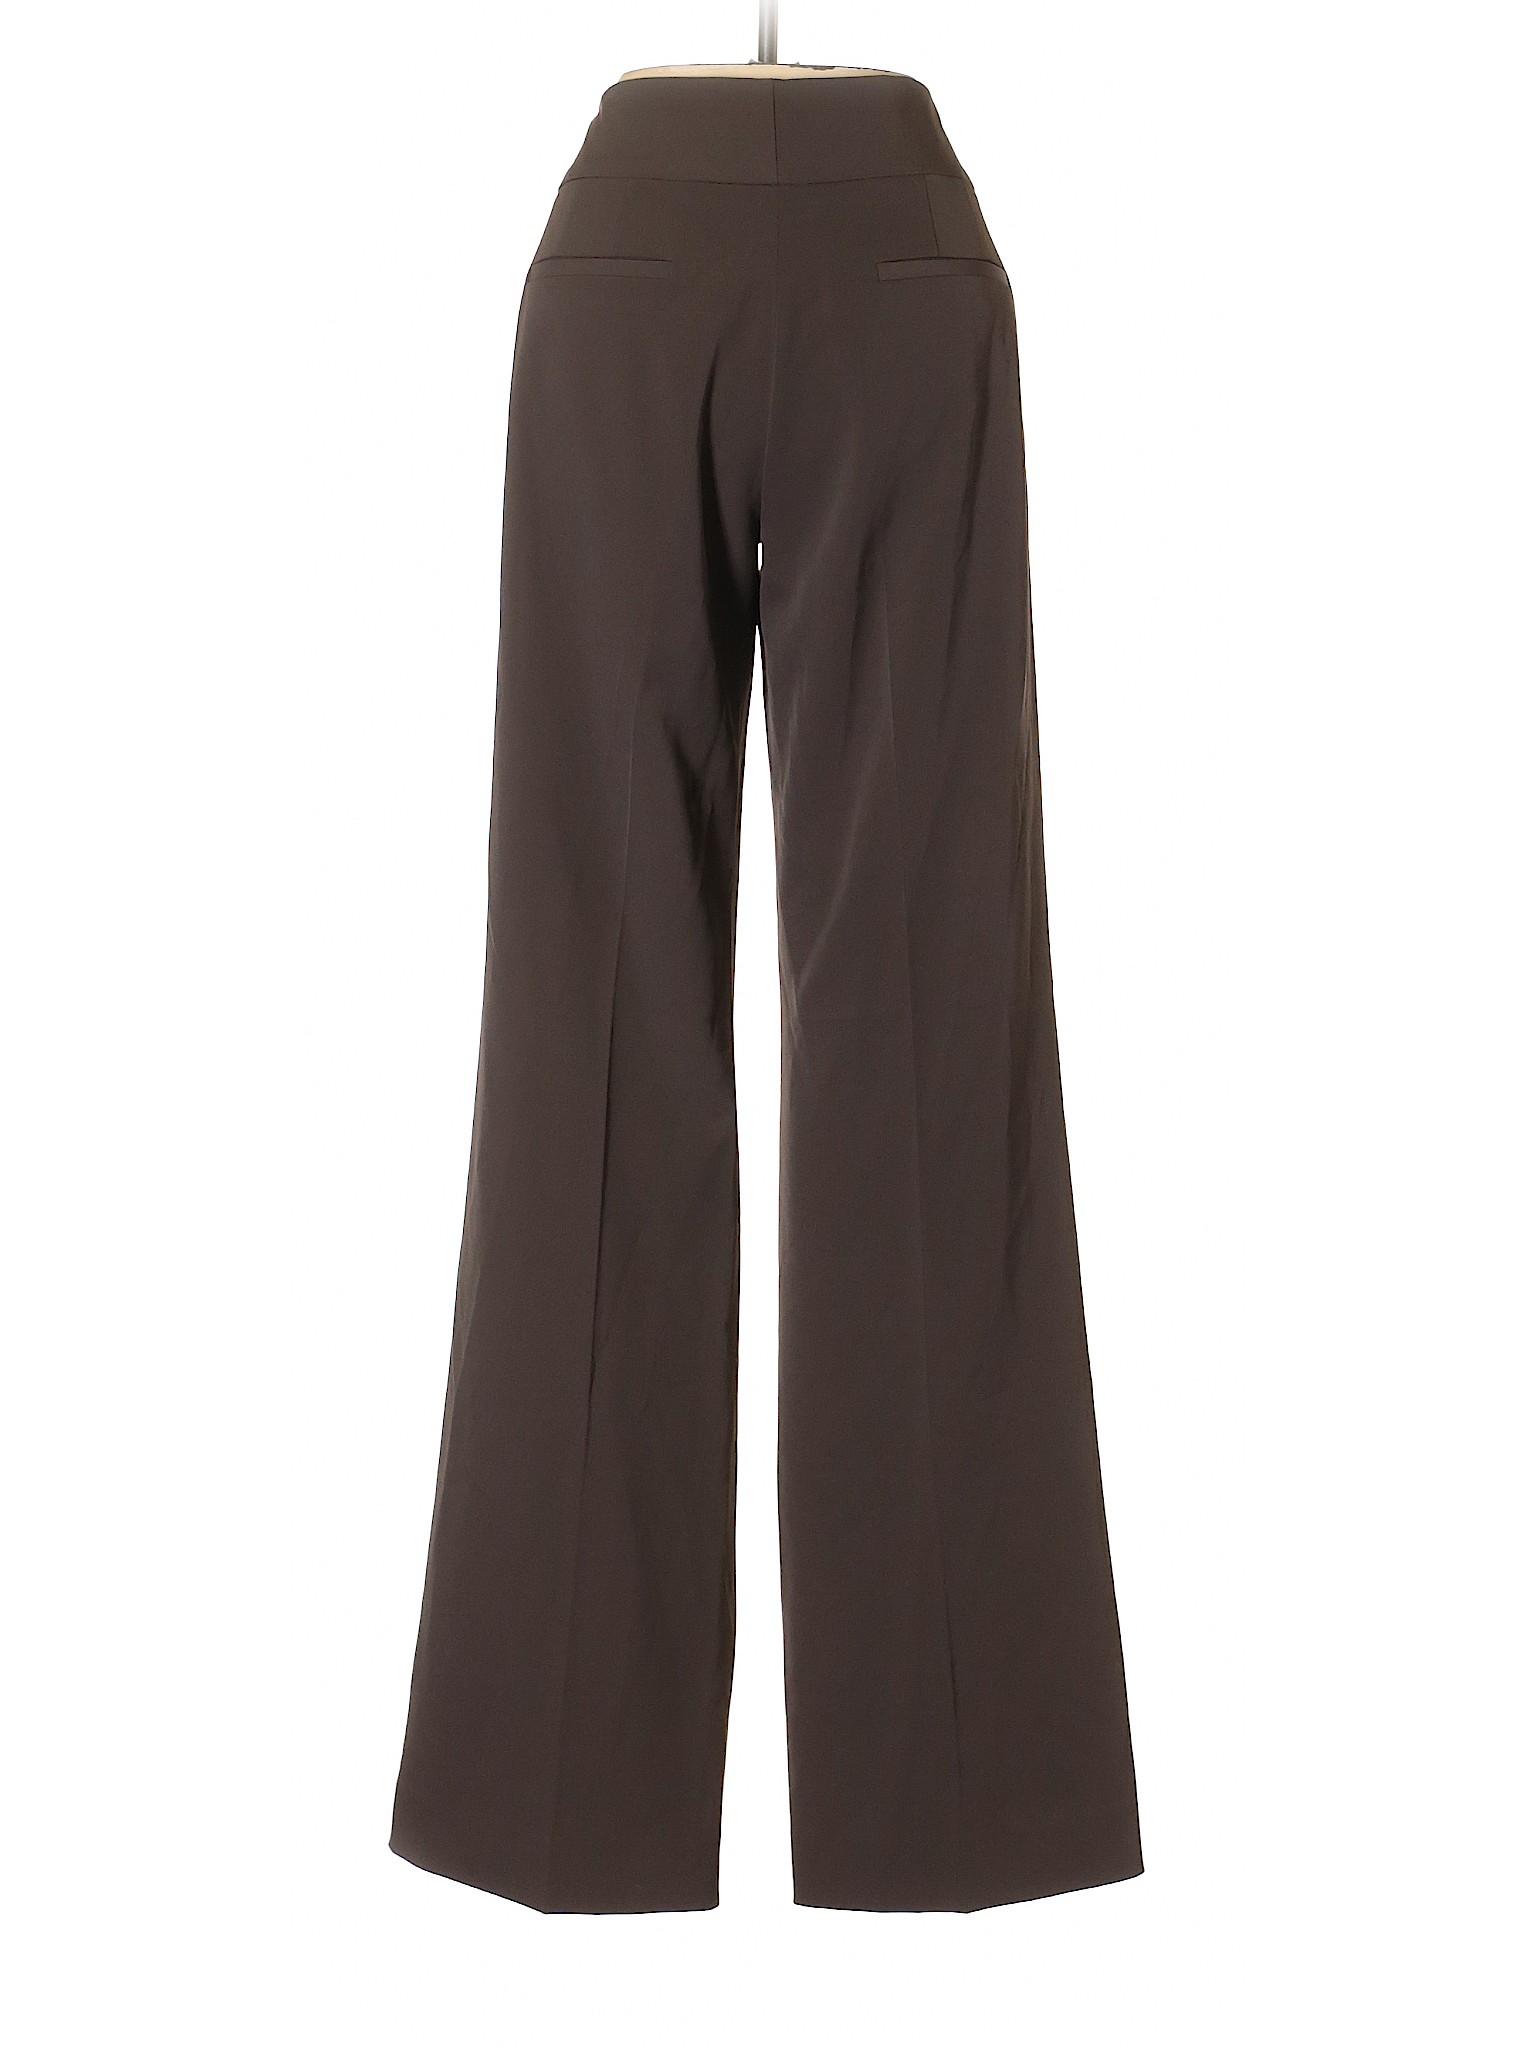 Dress Tahari Pants Boutique Tahari Boutique Boutique Pants Dress xAwRTHY